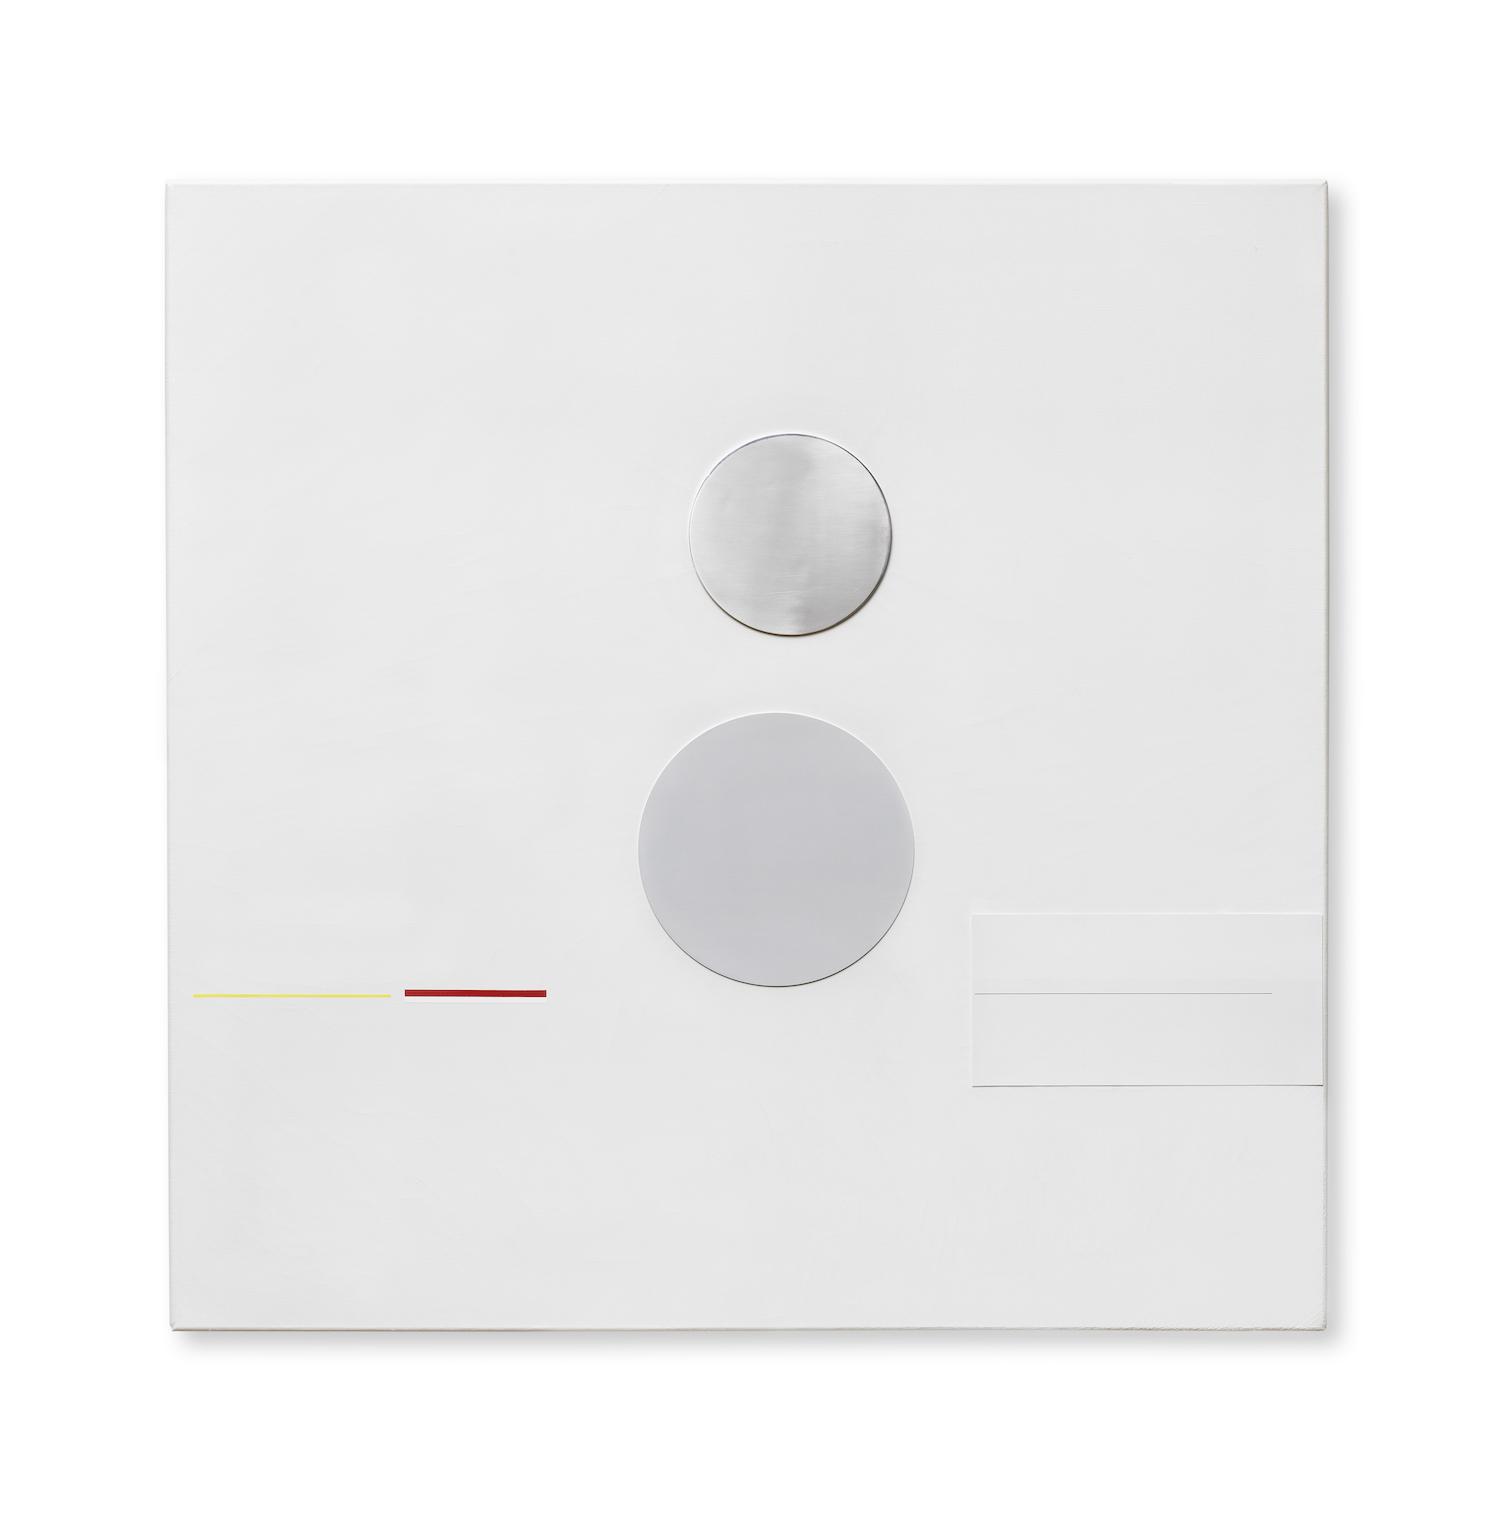 Richard Lin, 'Painting Relief', 1961, copper rectangle, aluminium disc, diagonal blackon the stretcheroil, aluminium and copper on canvas, 101.6 x 101.6cm. Image courtesy of Bonhams.